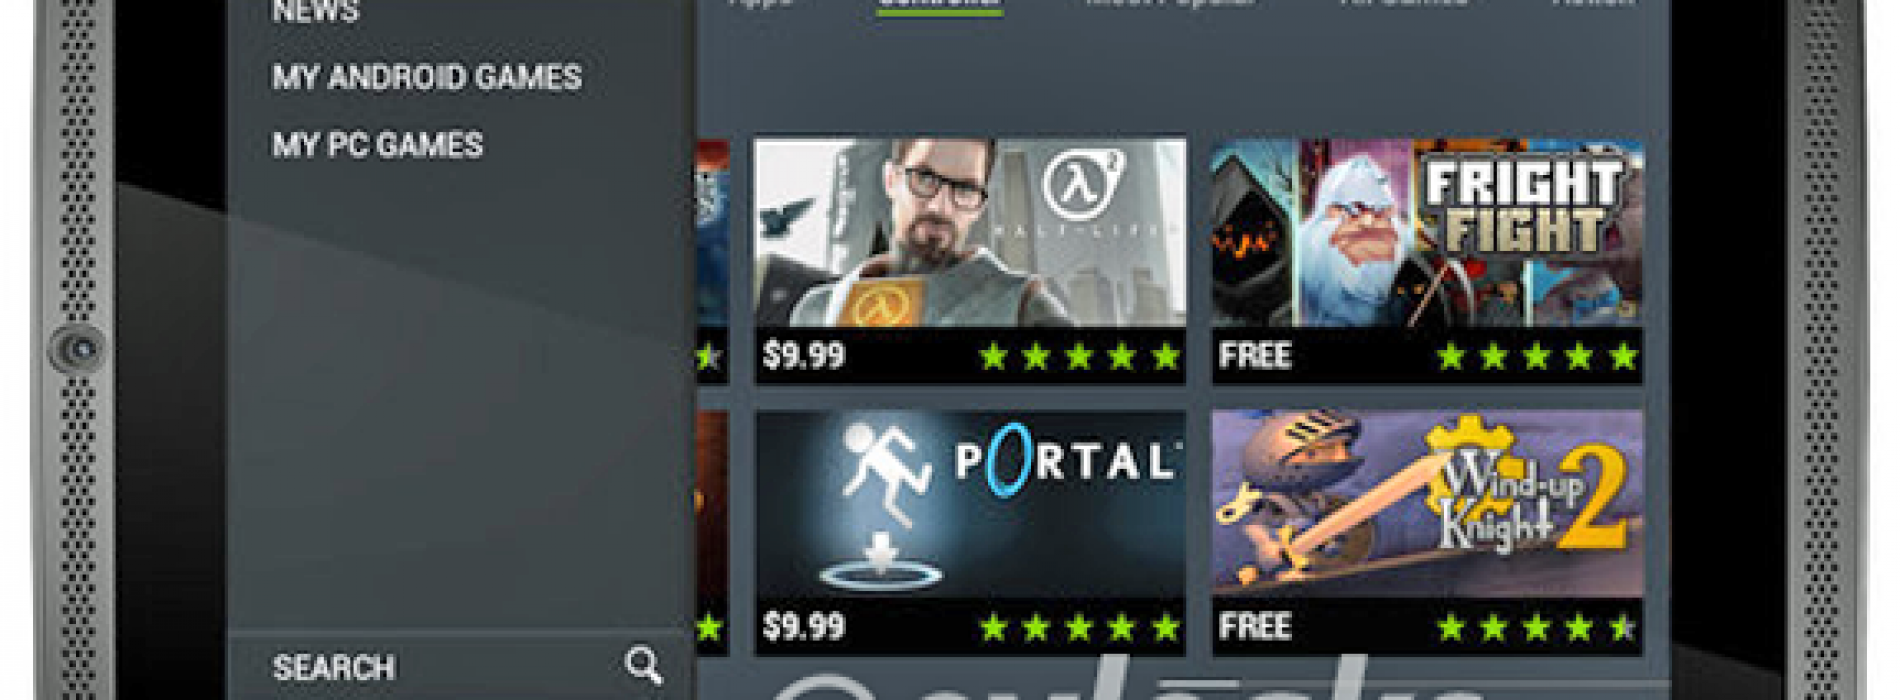 NVIDIA Shield tablet image leaks